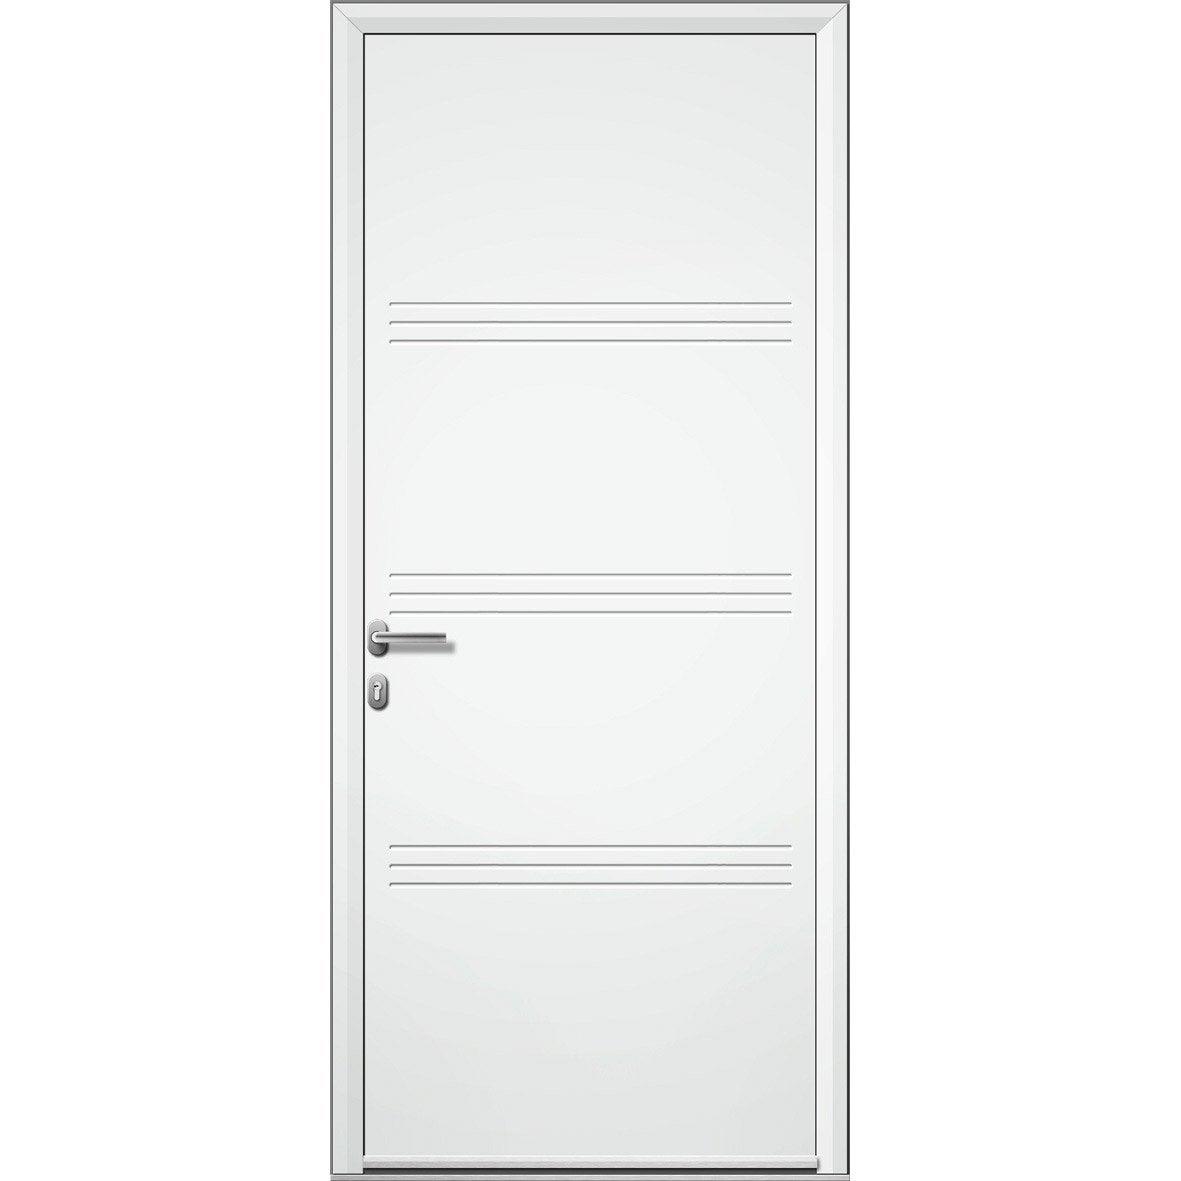 Porte d 39 entr e aluminium plano artens poussant gauche h - Porte entree alu leroy merlin ...